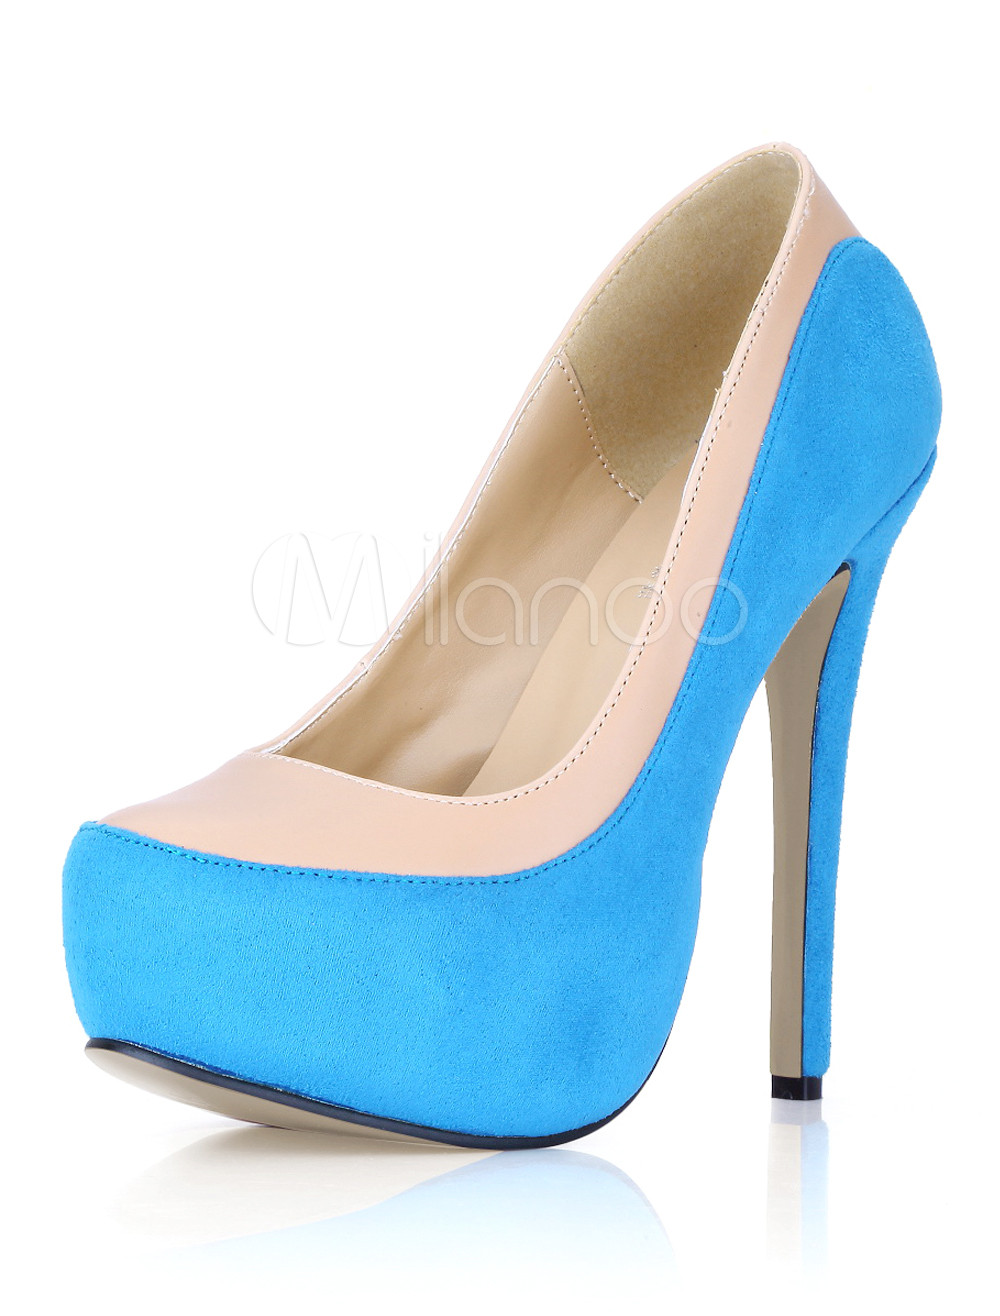 Zapatos de plataforma de gamuza de color celeste s4Nom